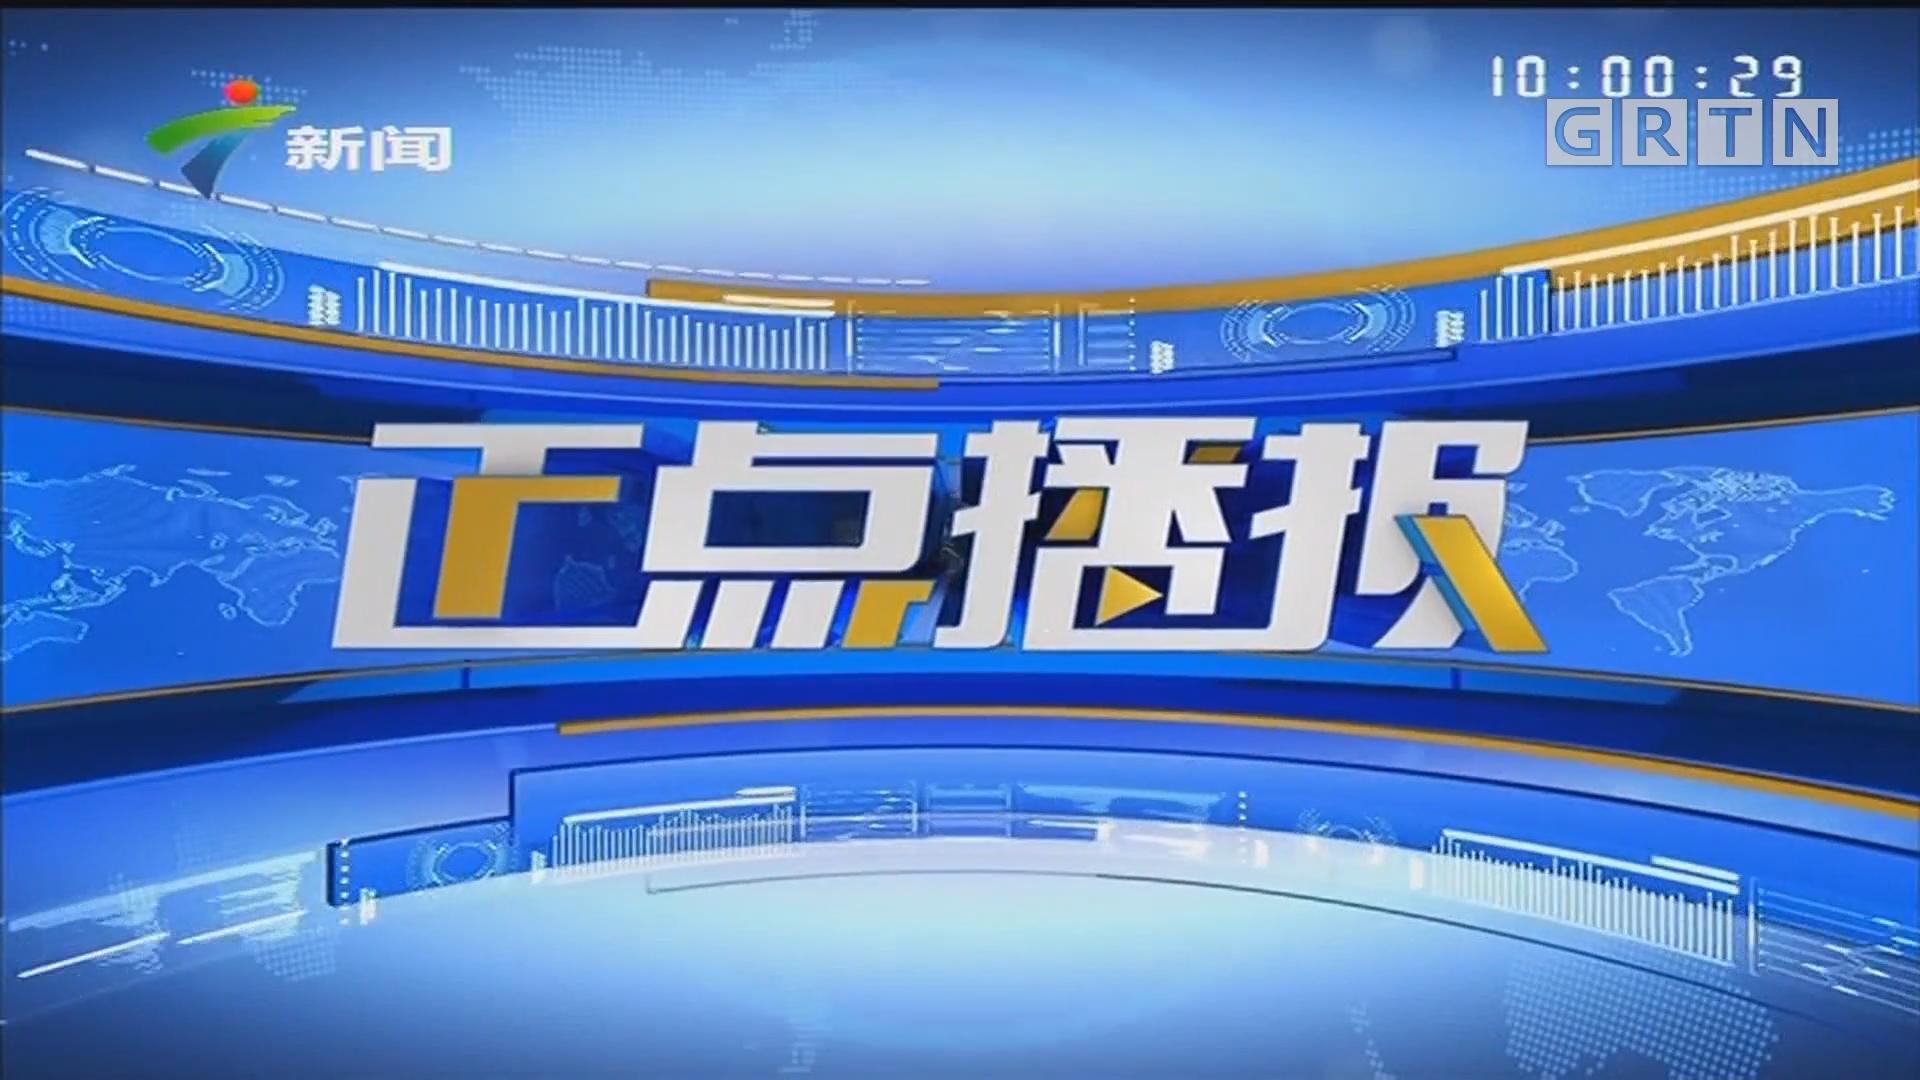 [HD][2019-08-14]正点播报:香港特区政府恢复举行行政会议 林郑月娥:反对暴力 维护法治